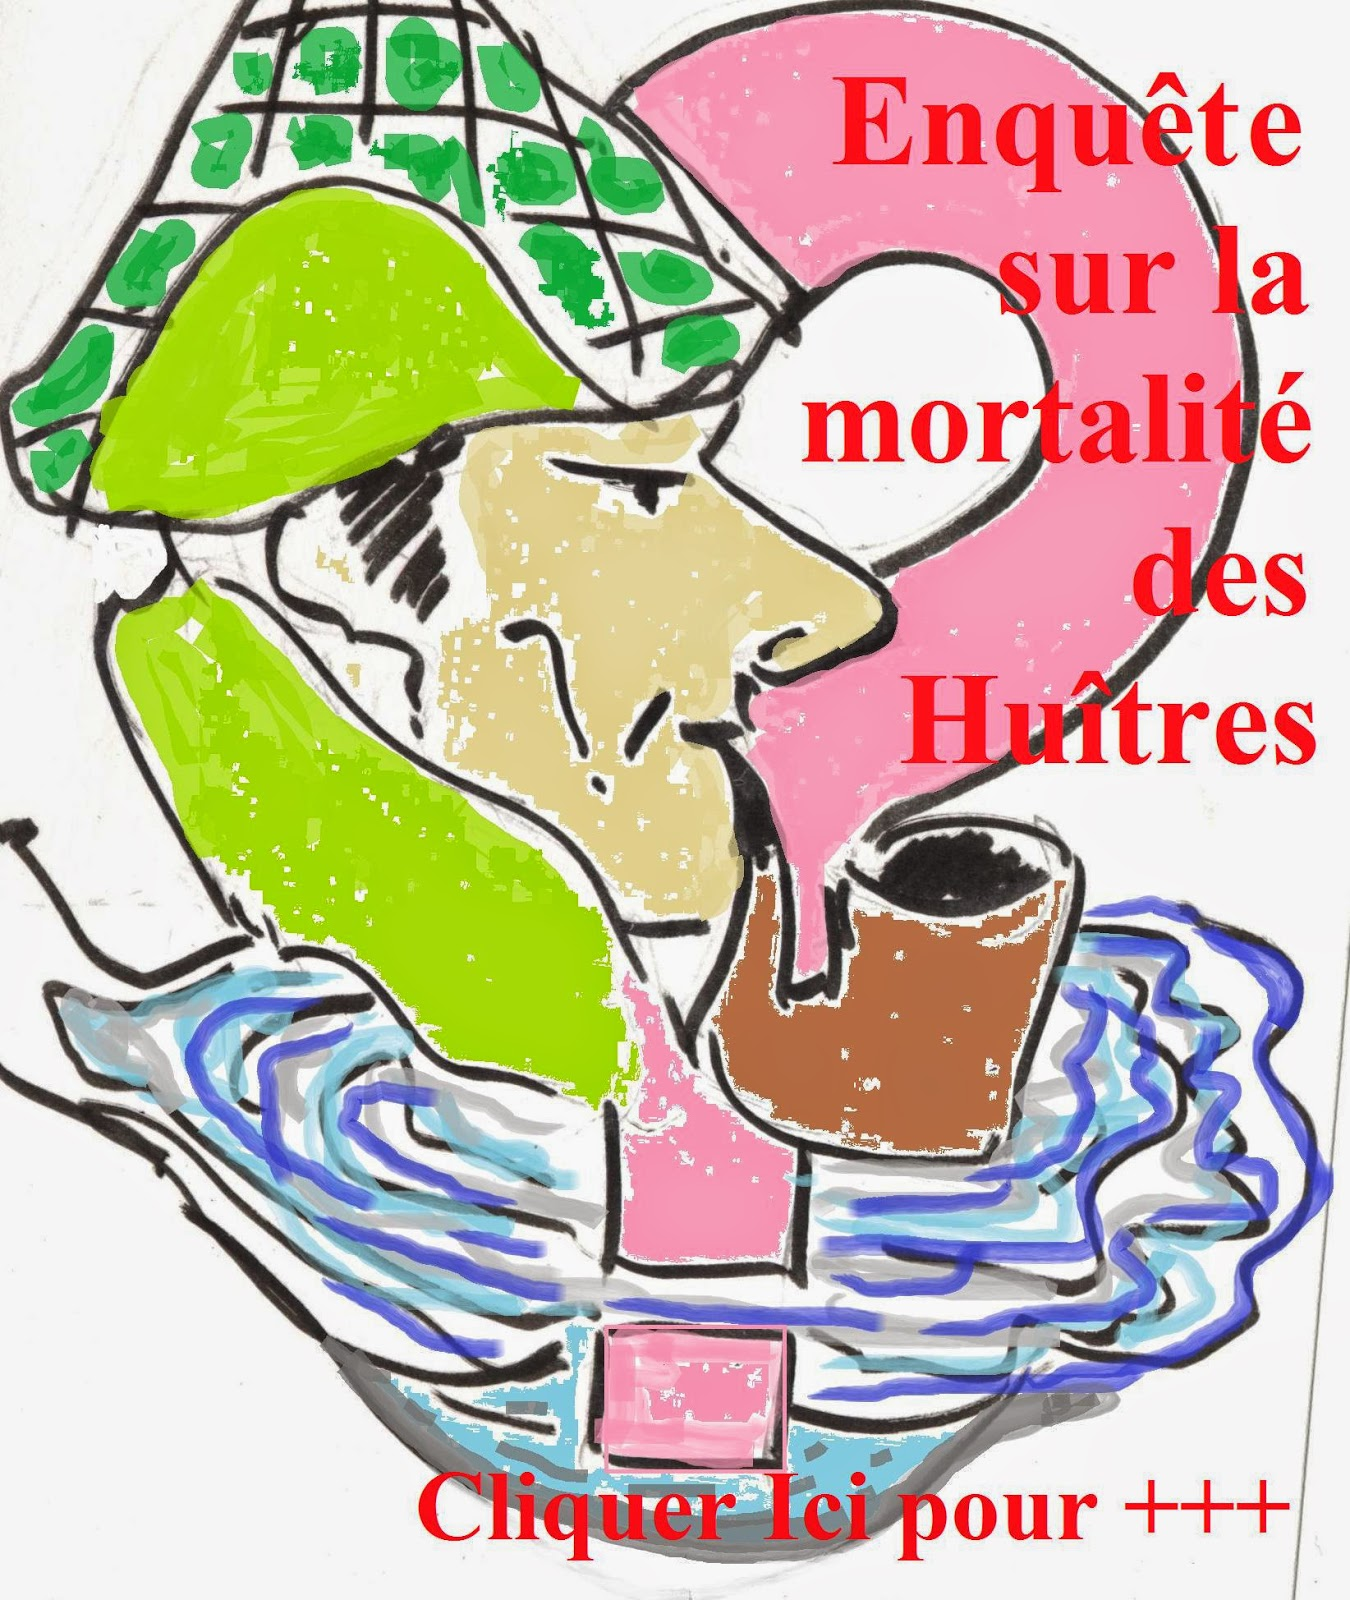 http://aquaculture-aquablog.blogspot.fr/2014/01/mortalite-huitre-enquete-le-bitoux.html